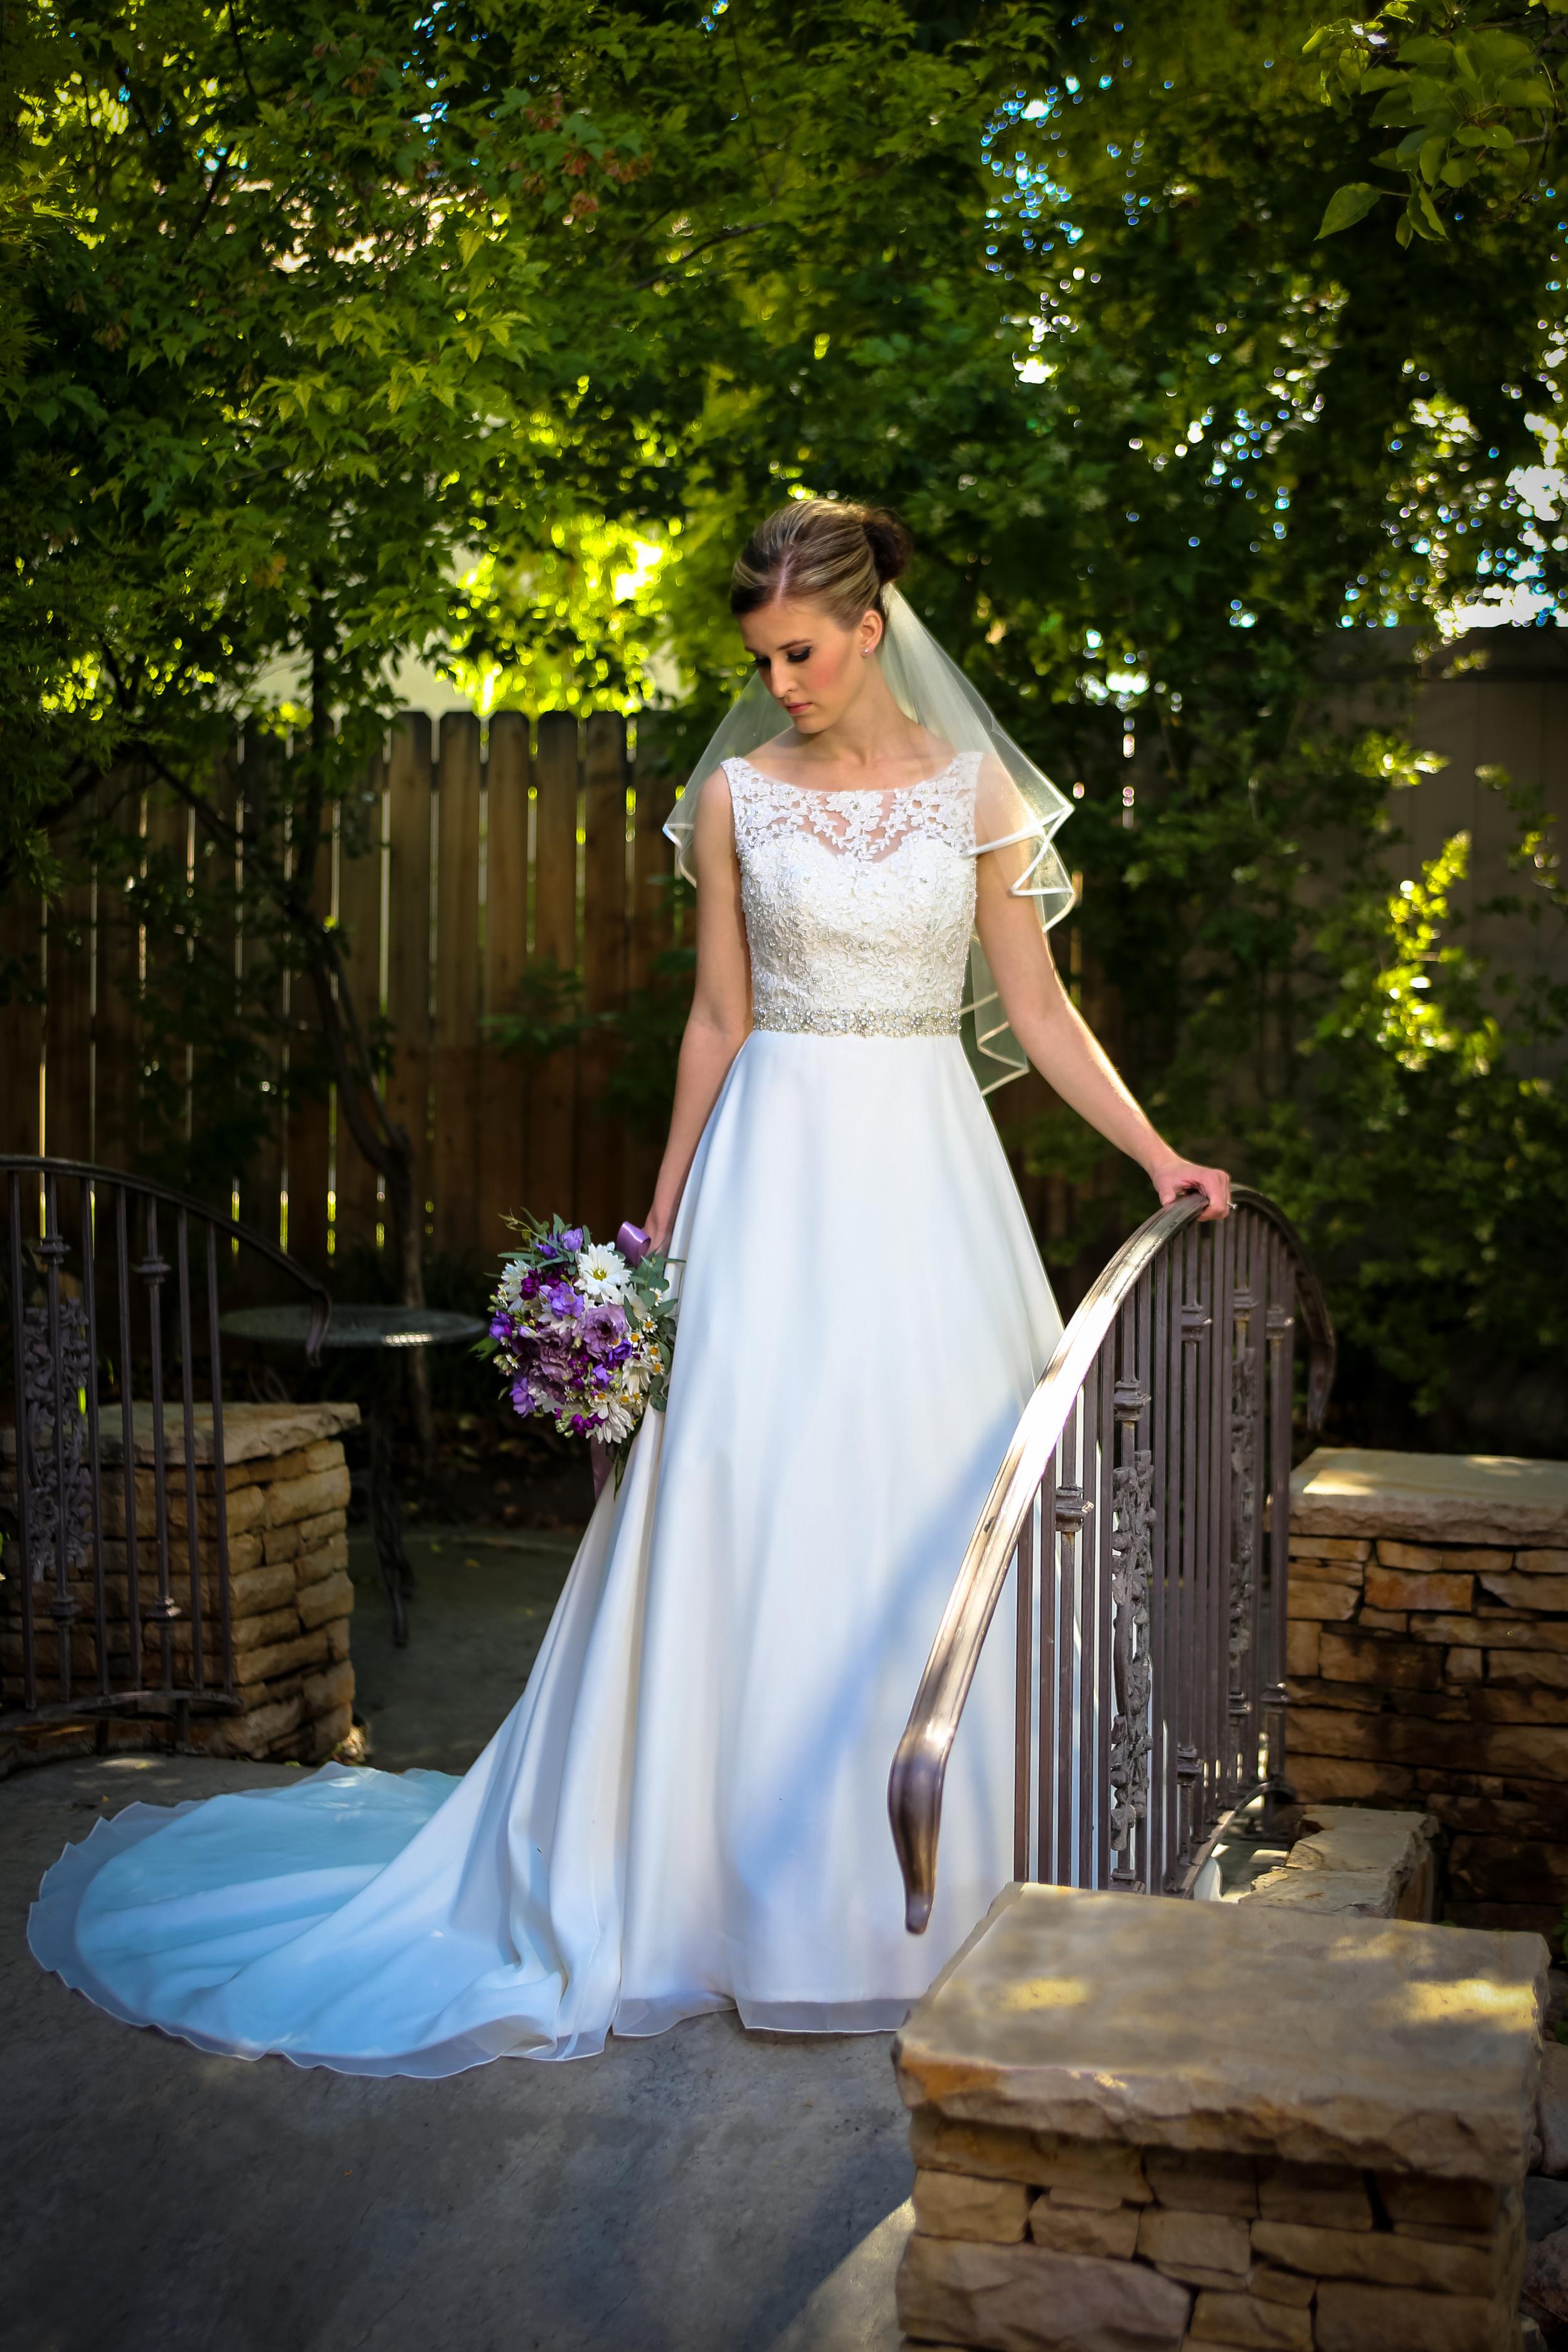 Bountiful bridal wedding photography